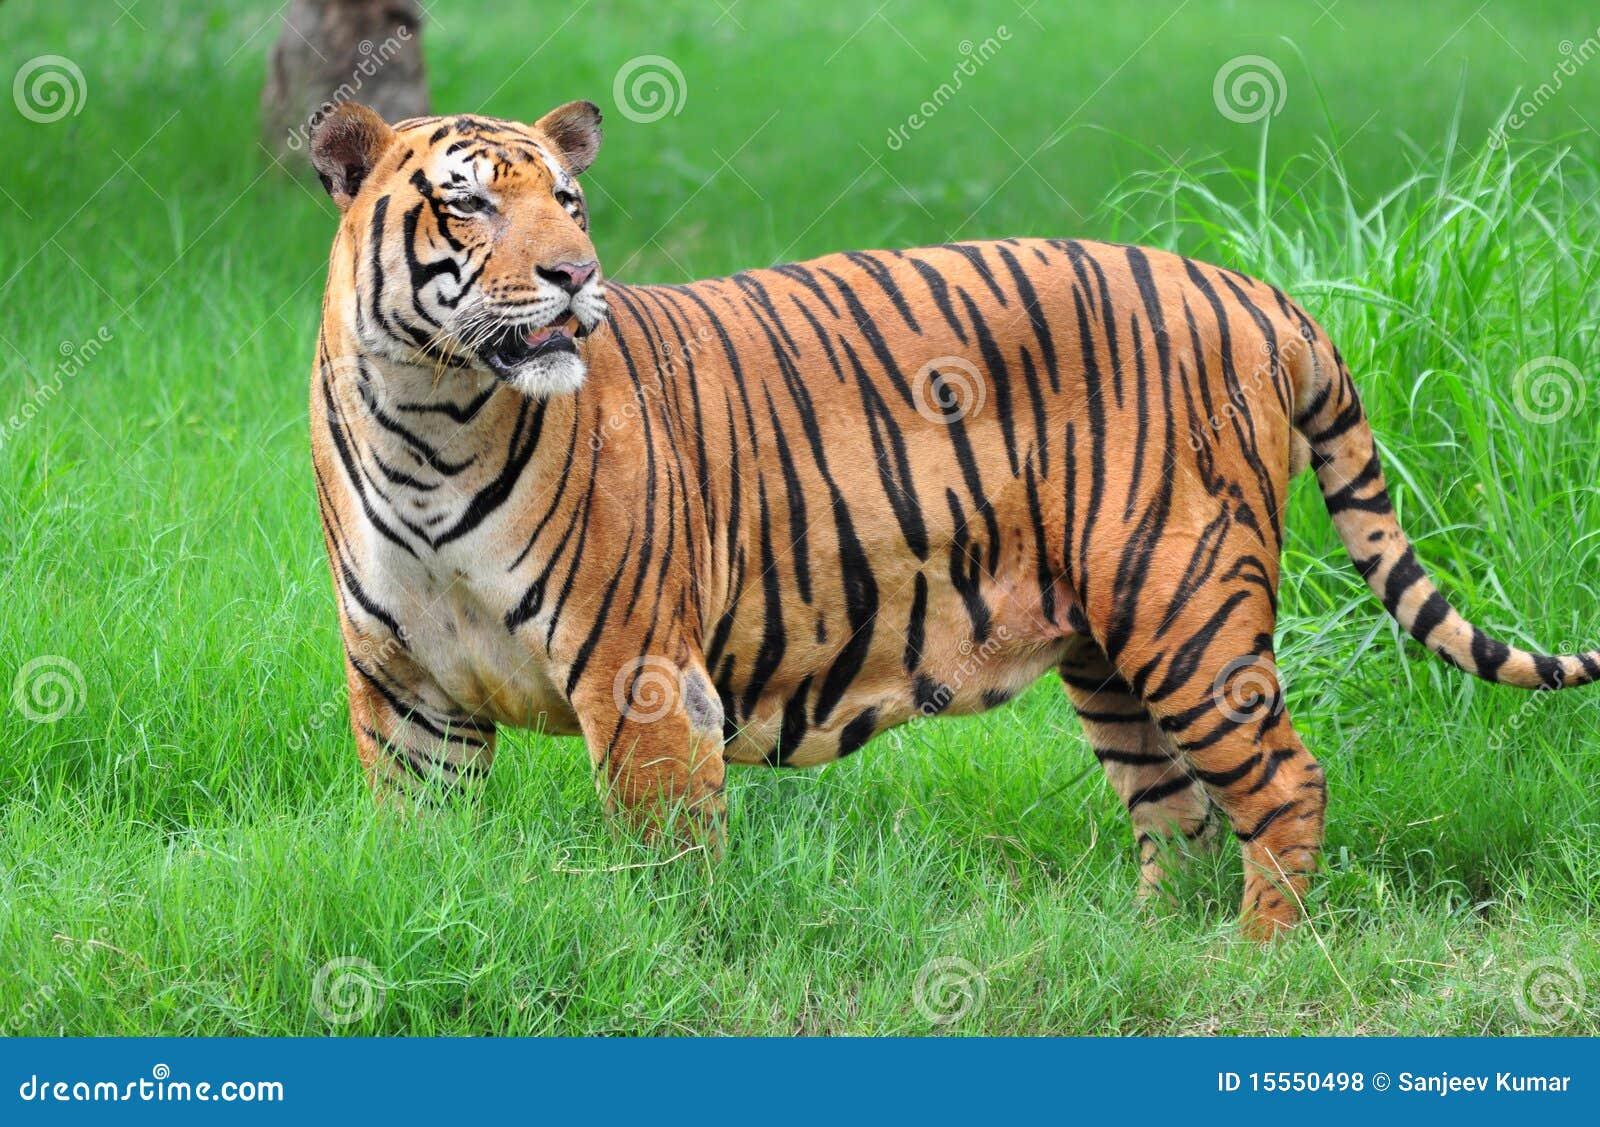 Tigre de bengala foto de archivo imagen de arbustos for Bengala asia